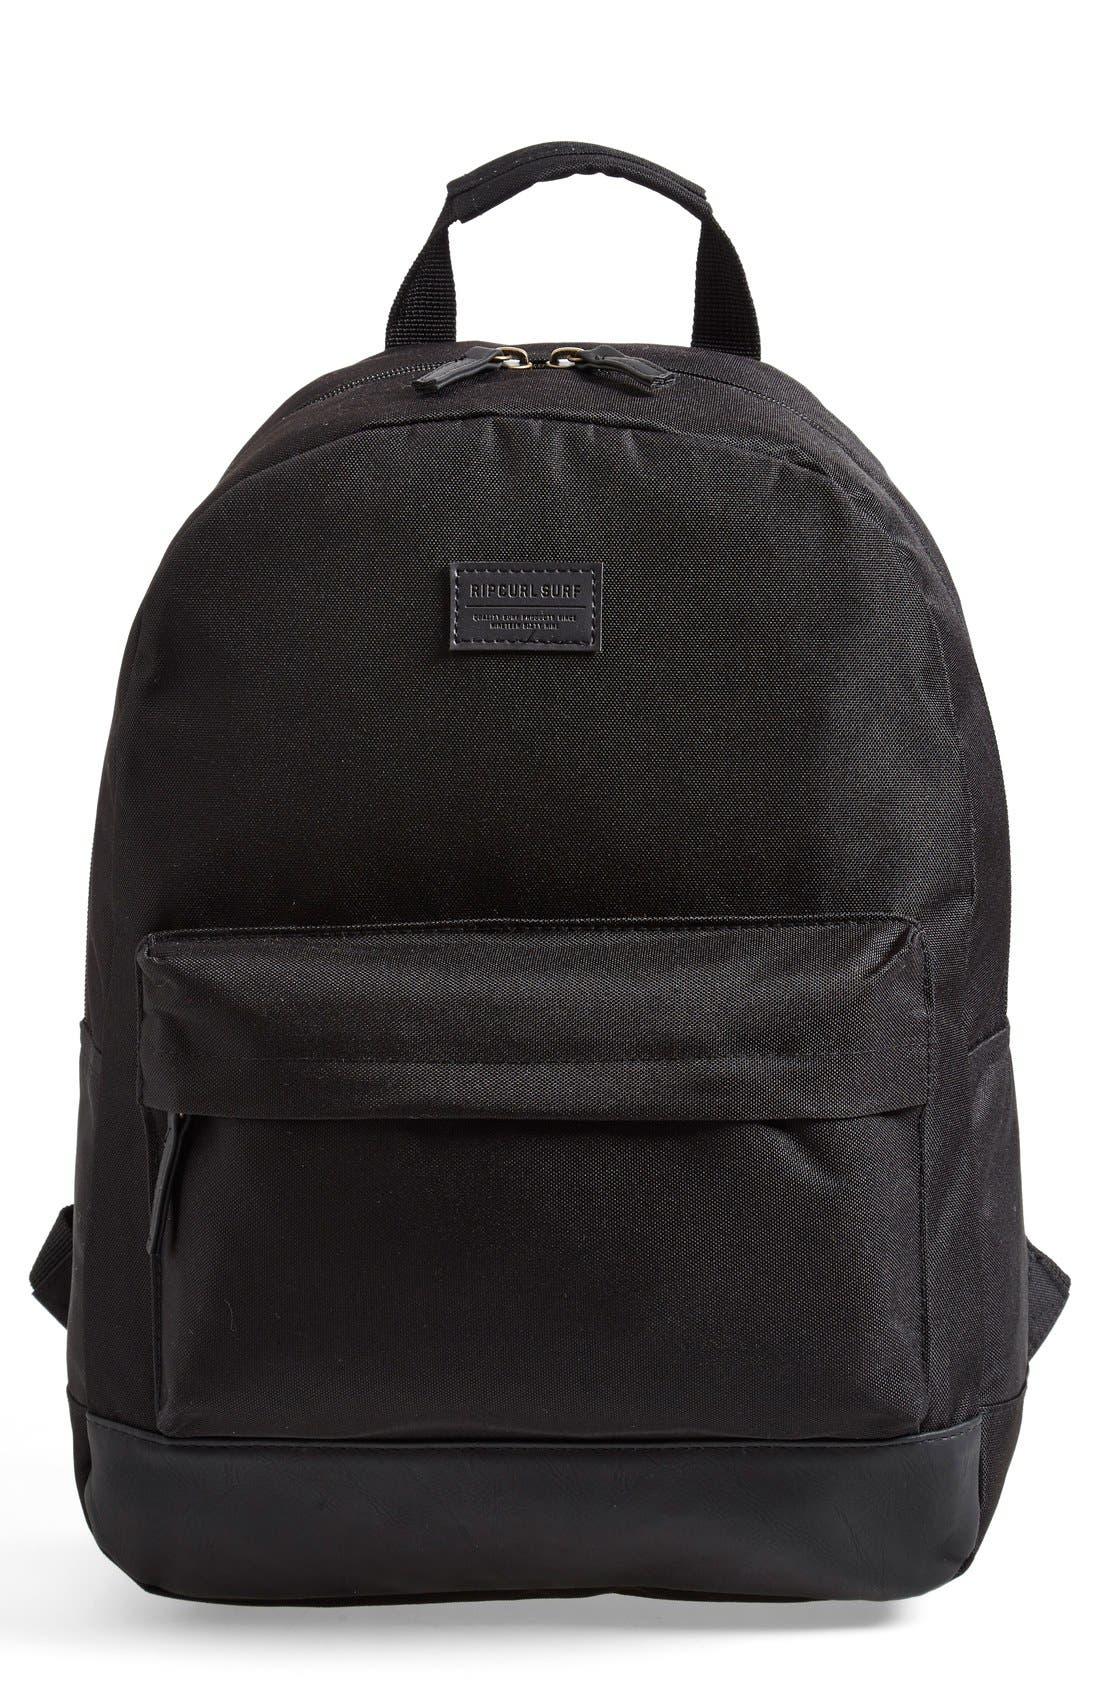 Alternate Image 1 Selected - Rip Curl 'Campus' Backpack